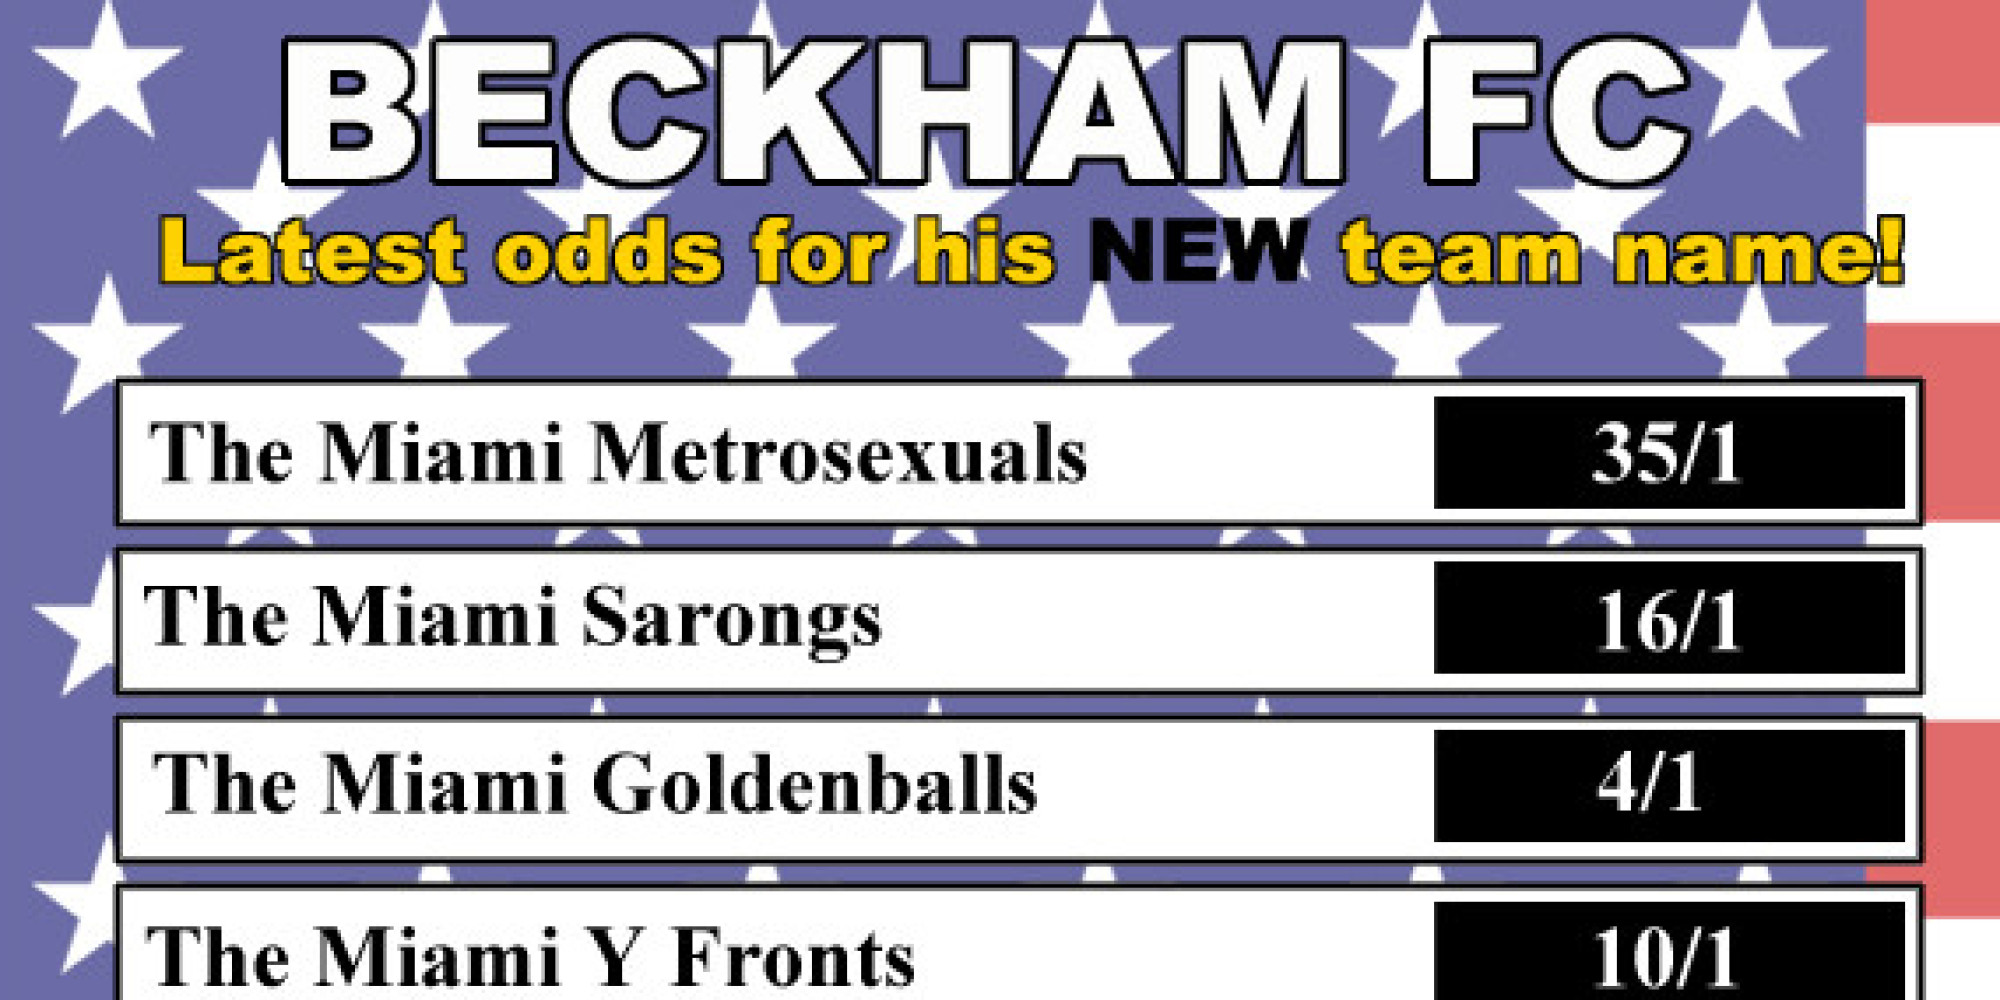 latest odds on david beckhams miami soccer team name